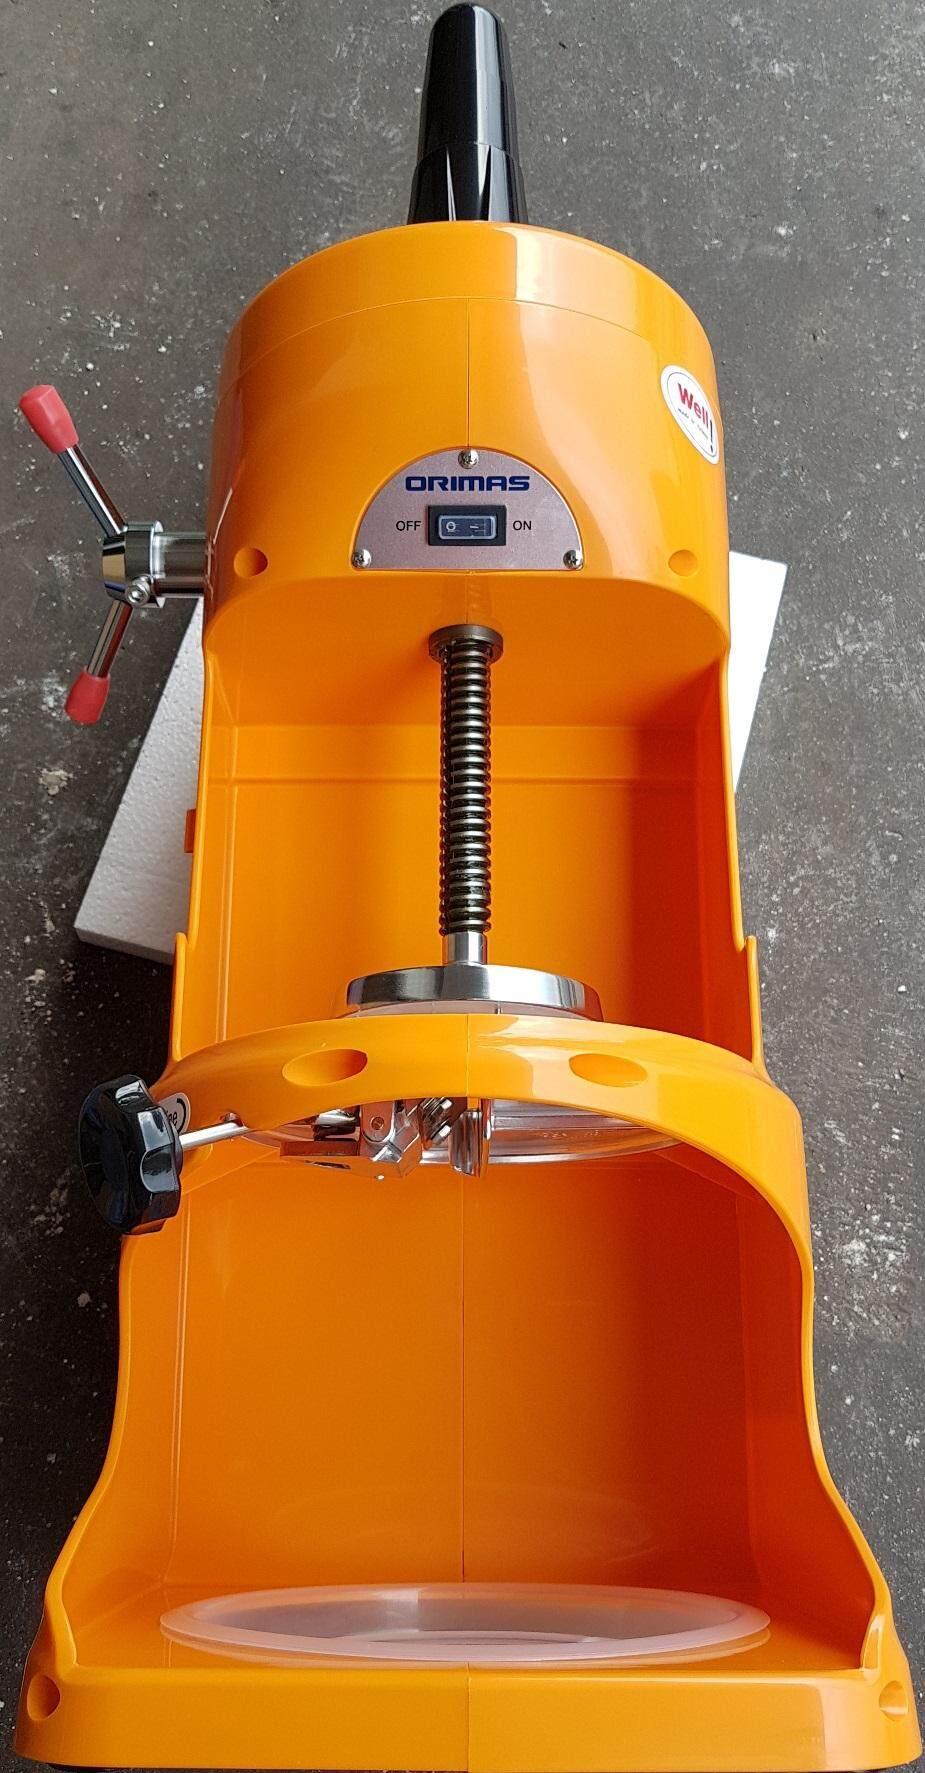 heavy duty 1 year warranty stainless steel snow flake piece sharp fine crusher block drill drilling global bear ice shaver ice blender  cutting cut cutter blade motor machine